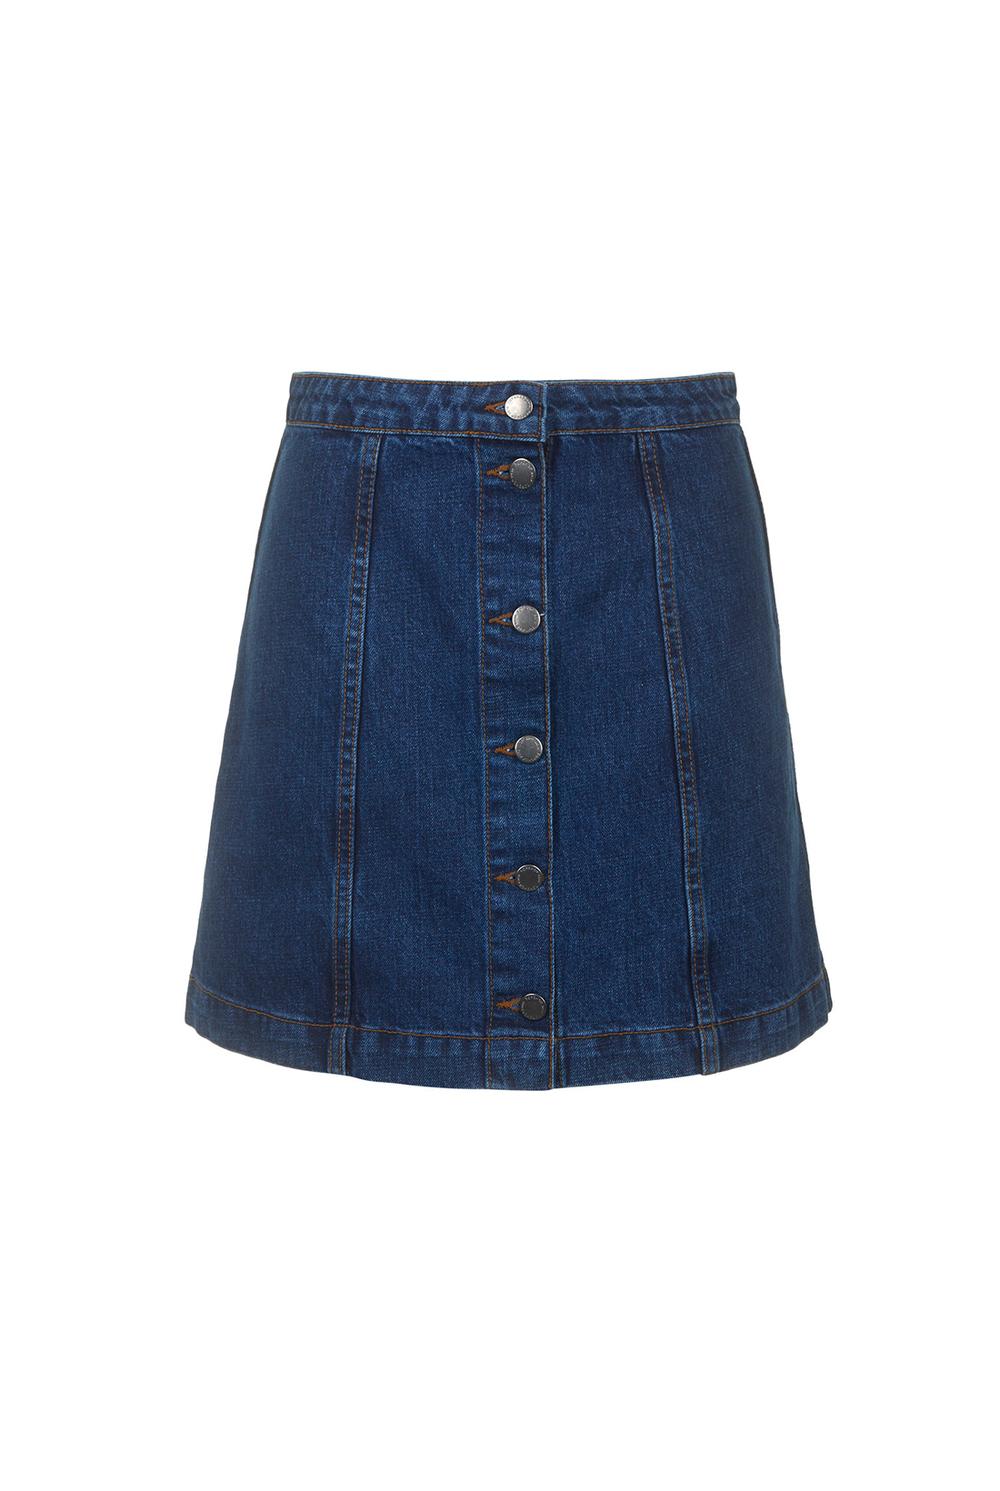 11-spring-denim-trends-button-down-skirt-05.jpg